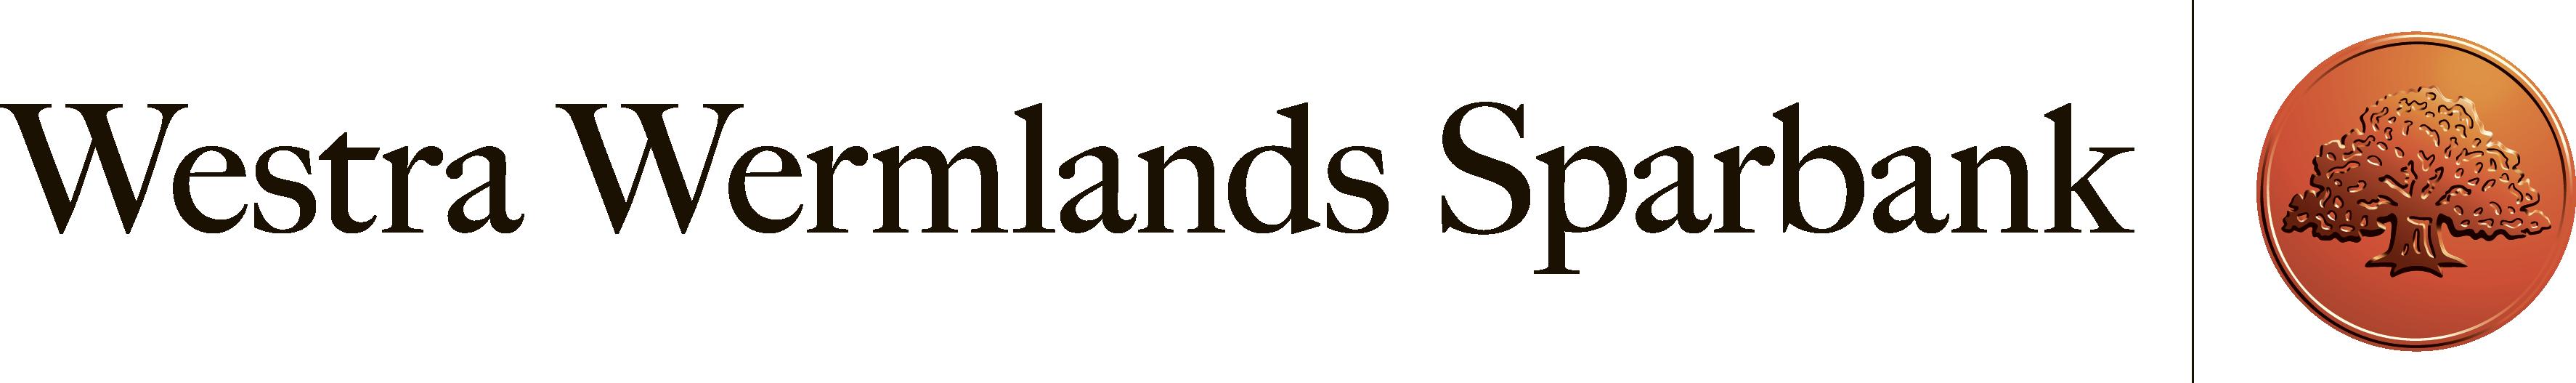 westra wermlands sparbank swedbank